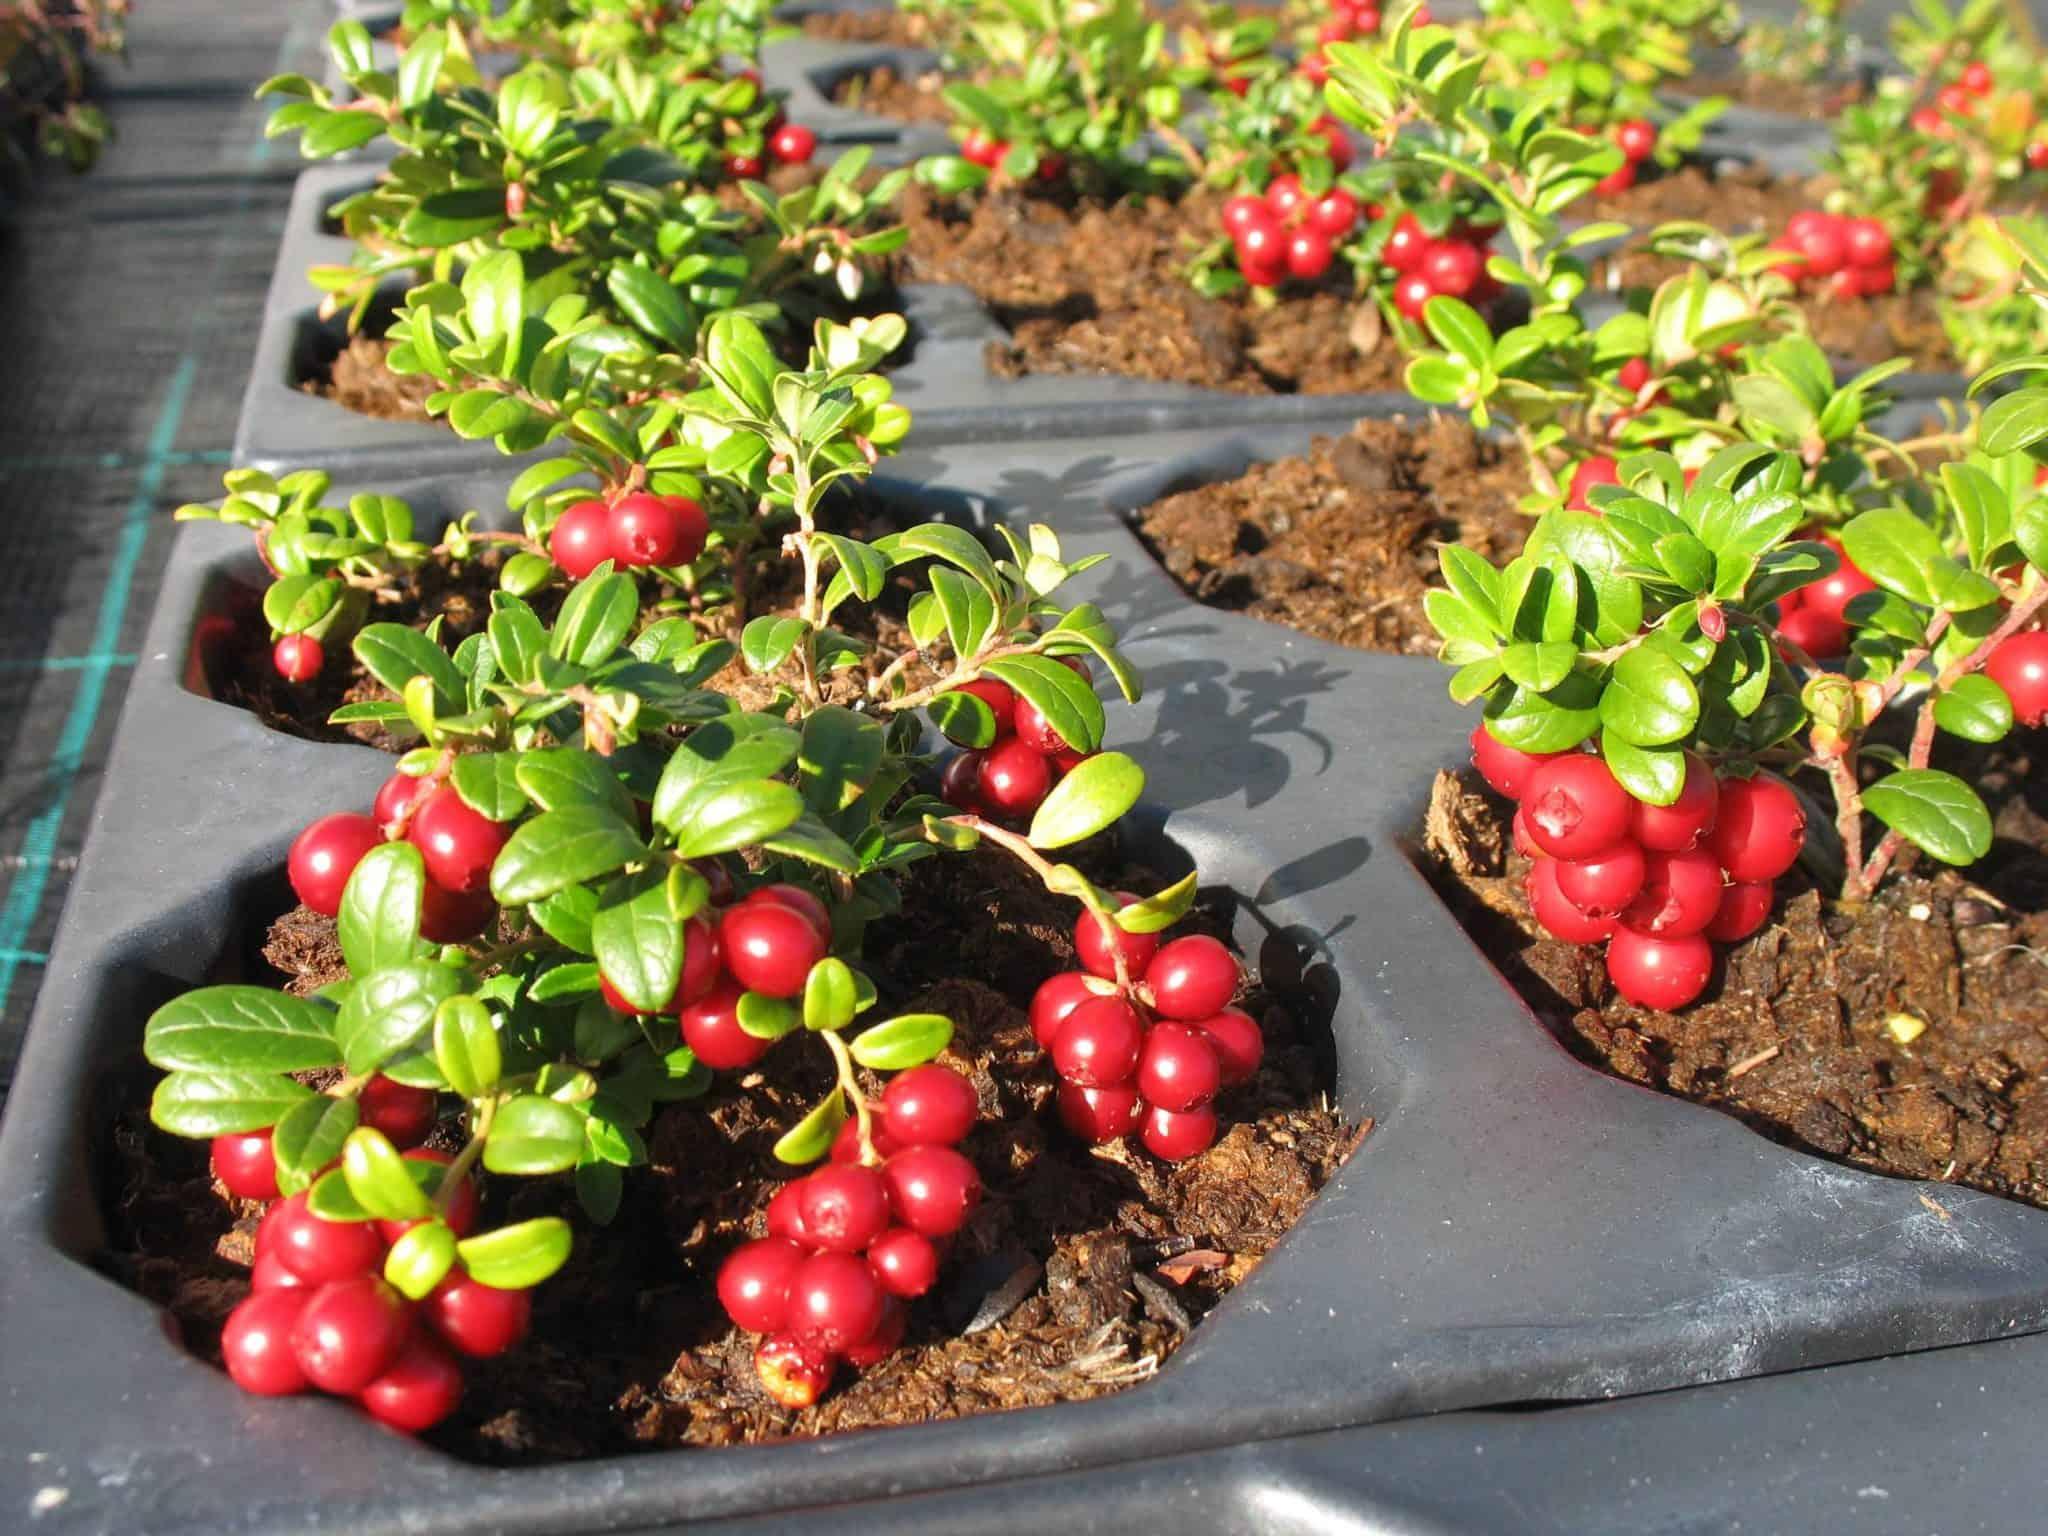 Lingon, Vaccinium vitis-idaea, vossebes, rode bosbes, Puolukka